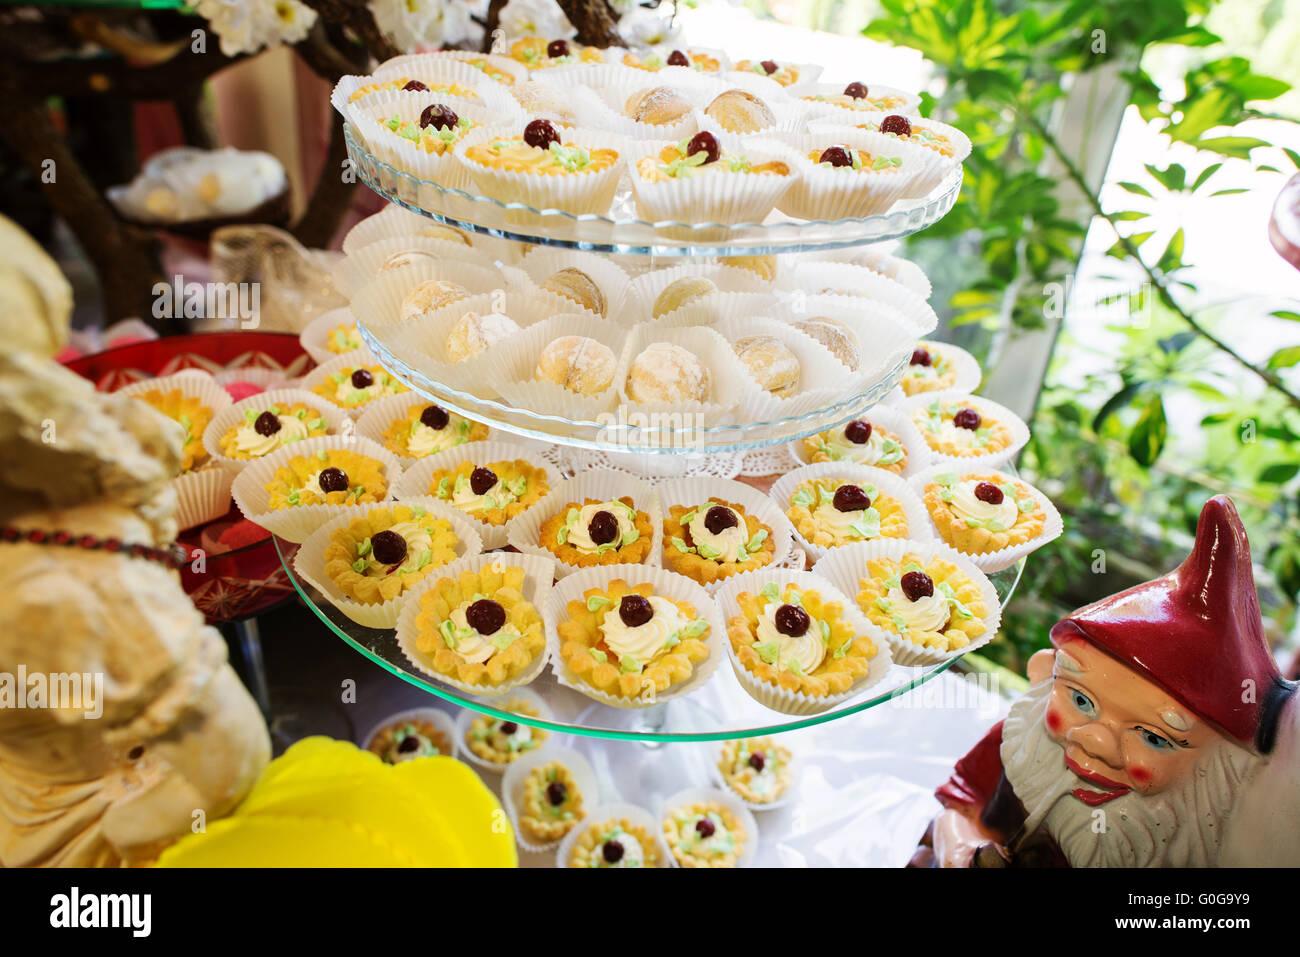 Very Expensive Wedding Cake Stock Photos & Very Expensive Wedding ...